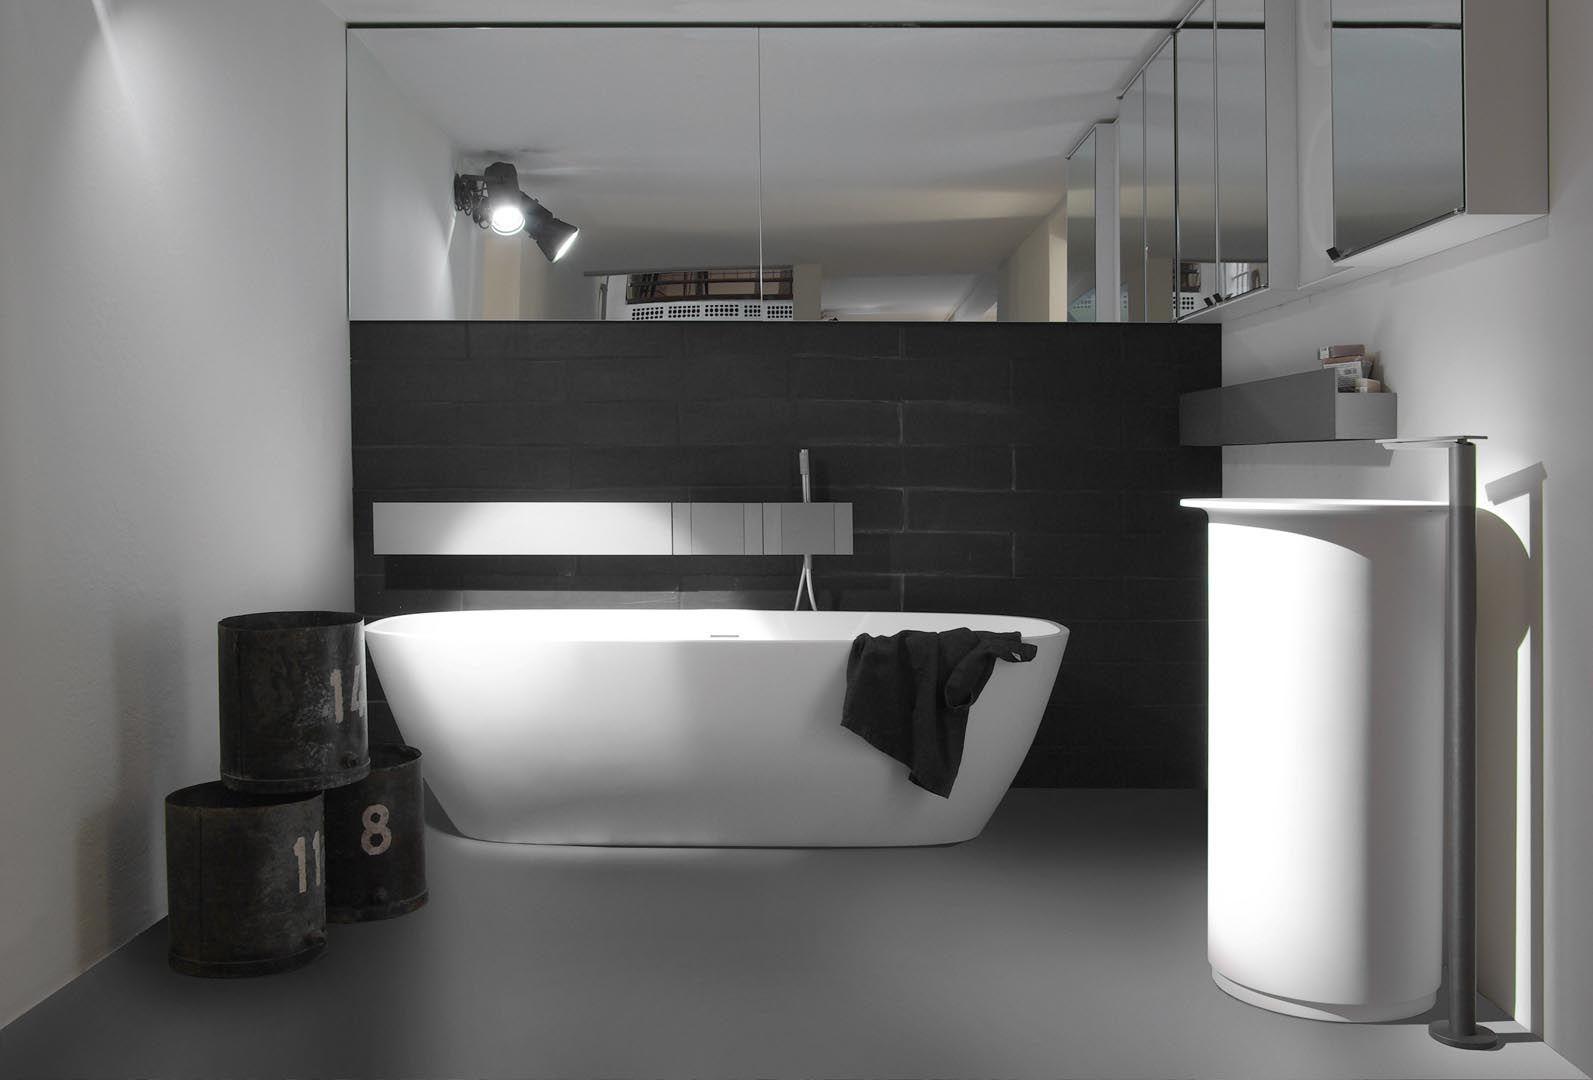 Ladekast Badkamer Badkamerverlichting : Badkamerverlichting op rail verlichting op maat verlichtjesteentje nl